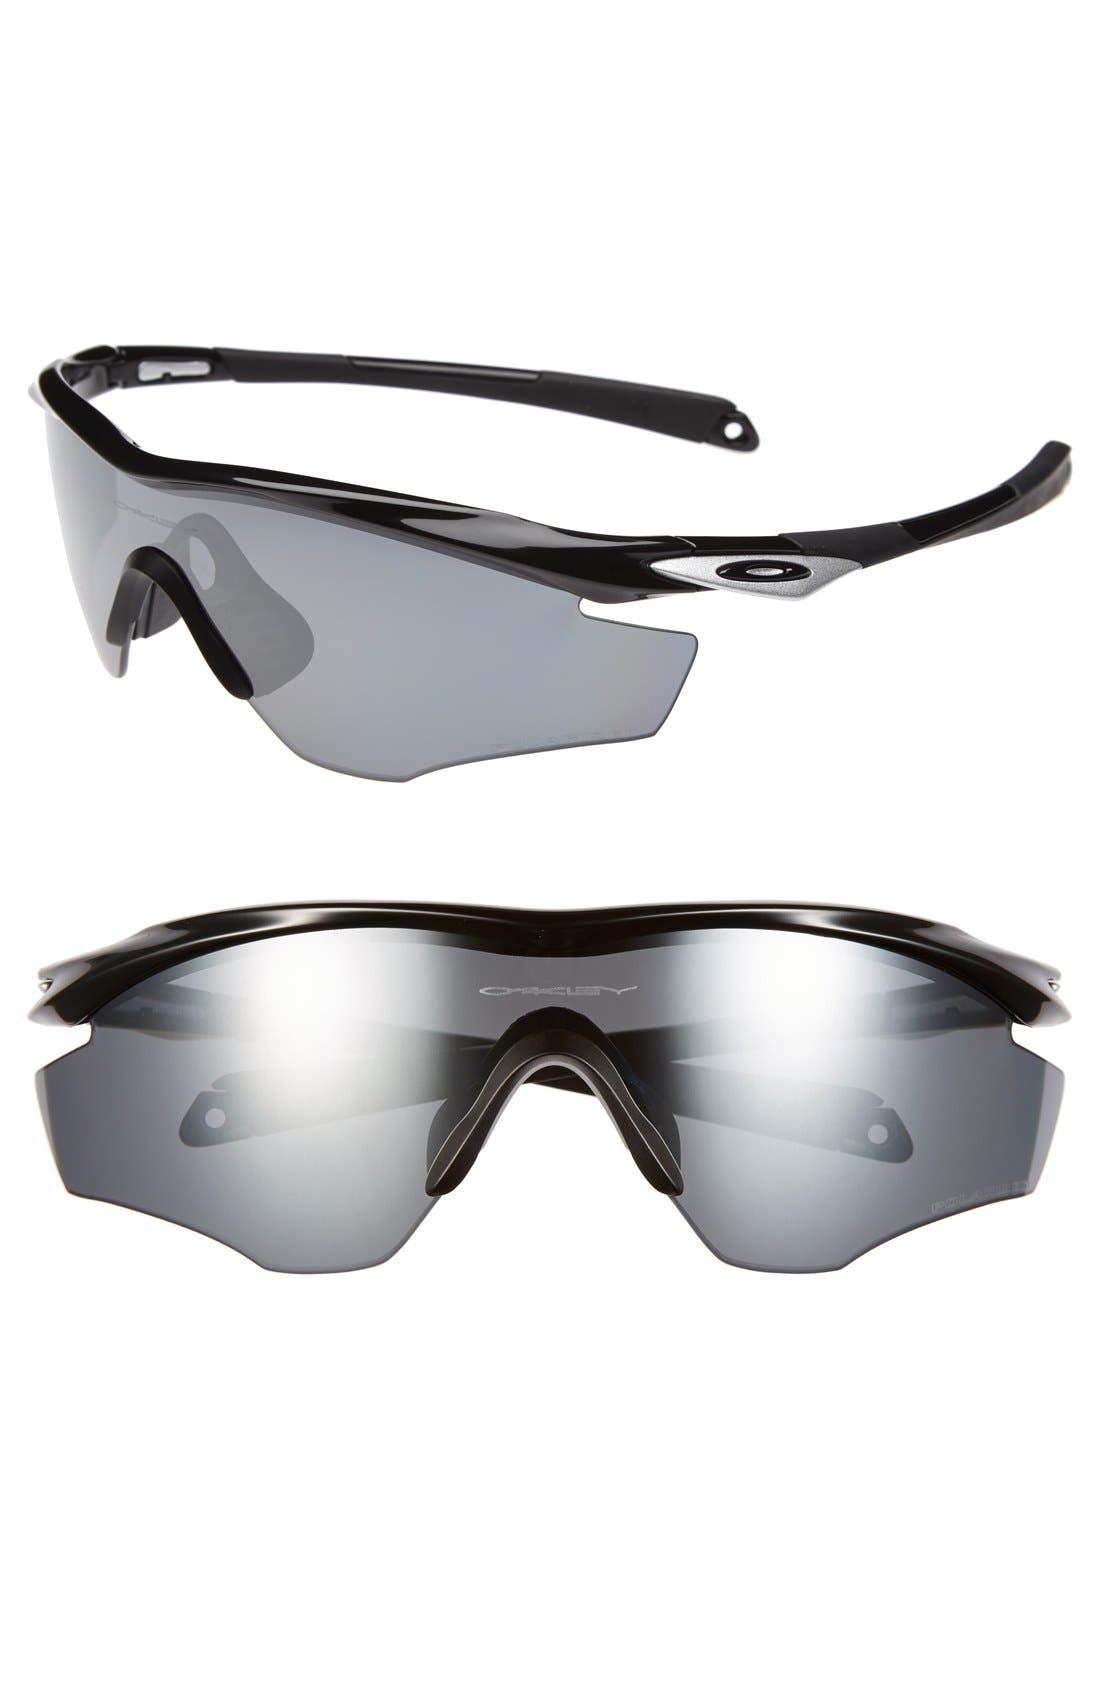 Main Image - Oakley 'M2 Frame' 175mm Polarized Shield Sunglasses